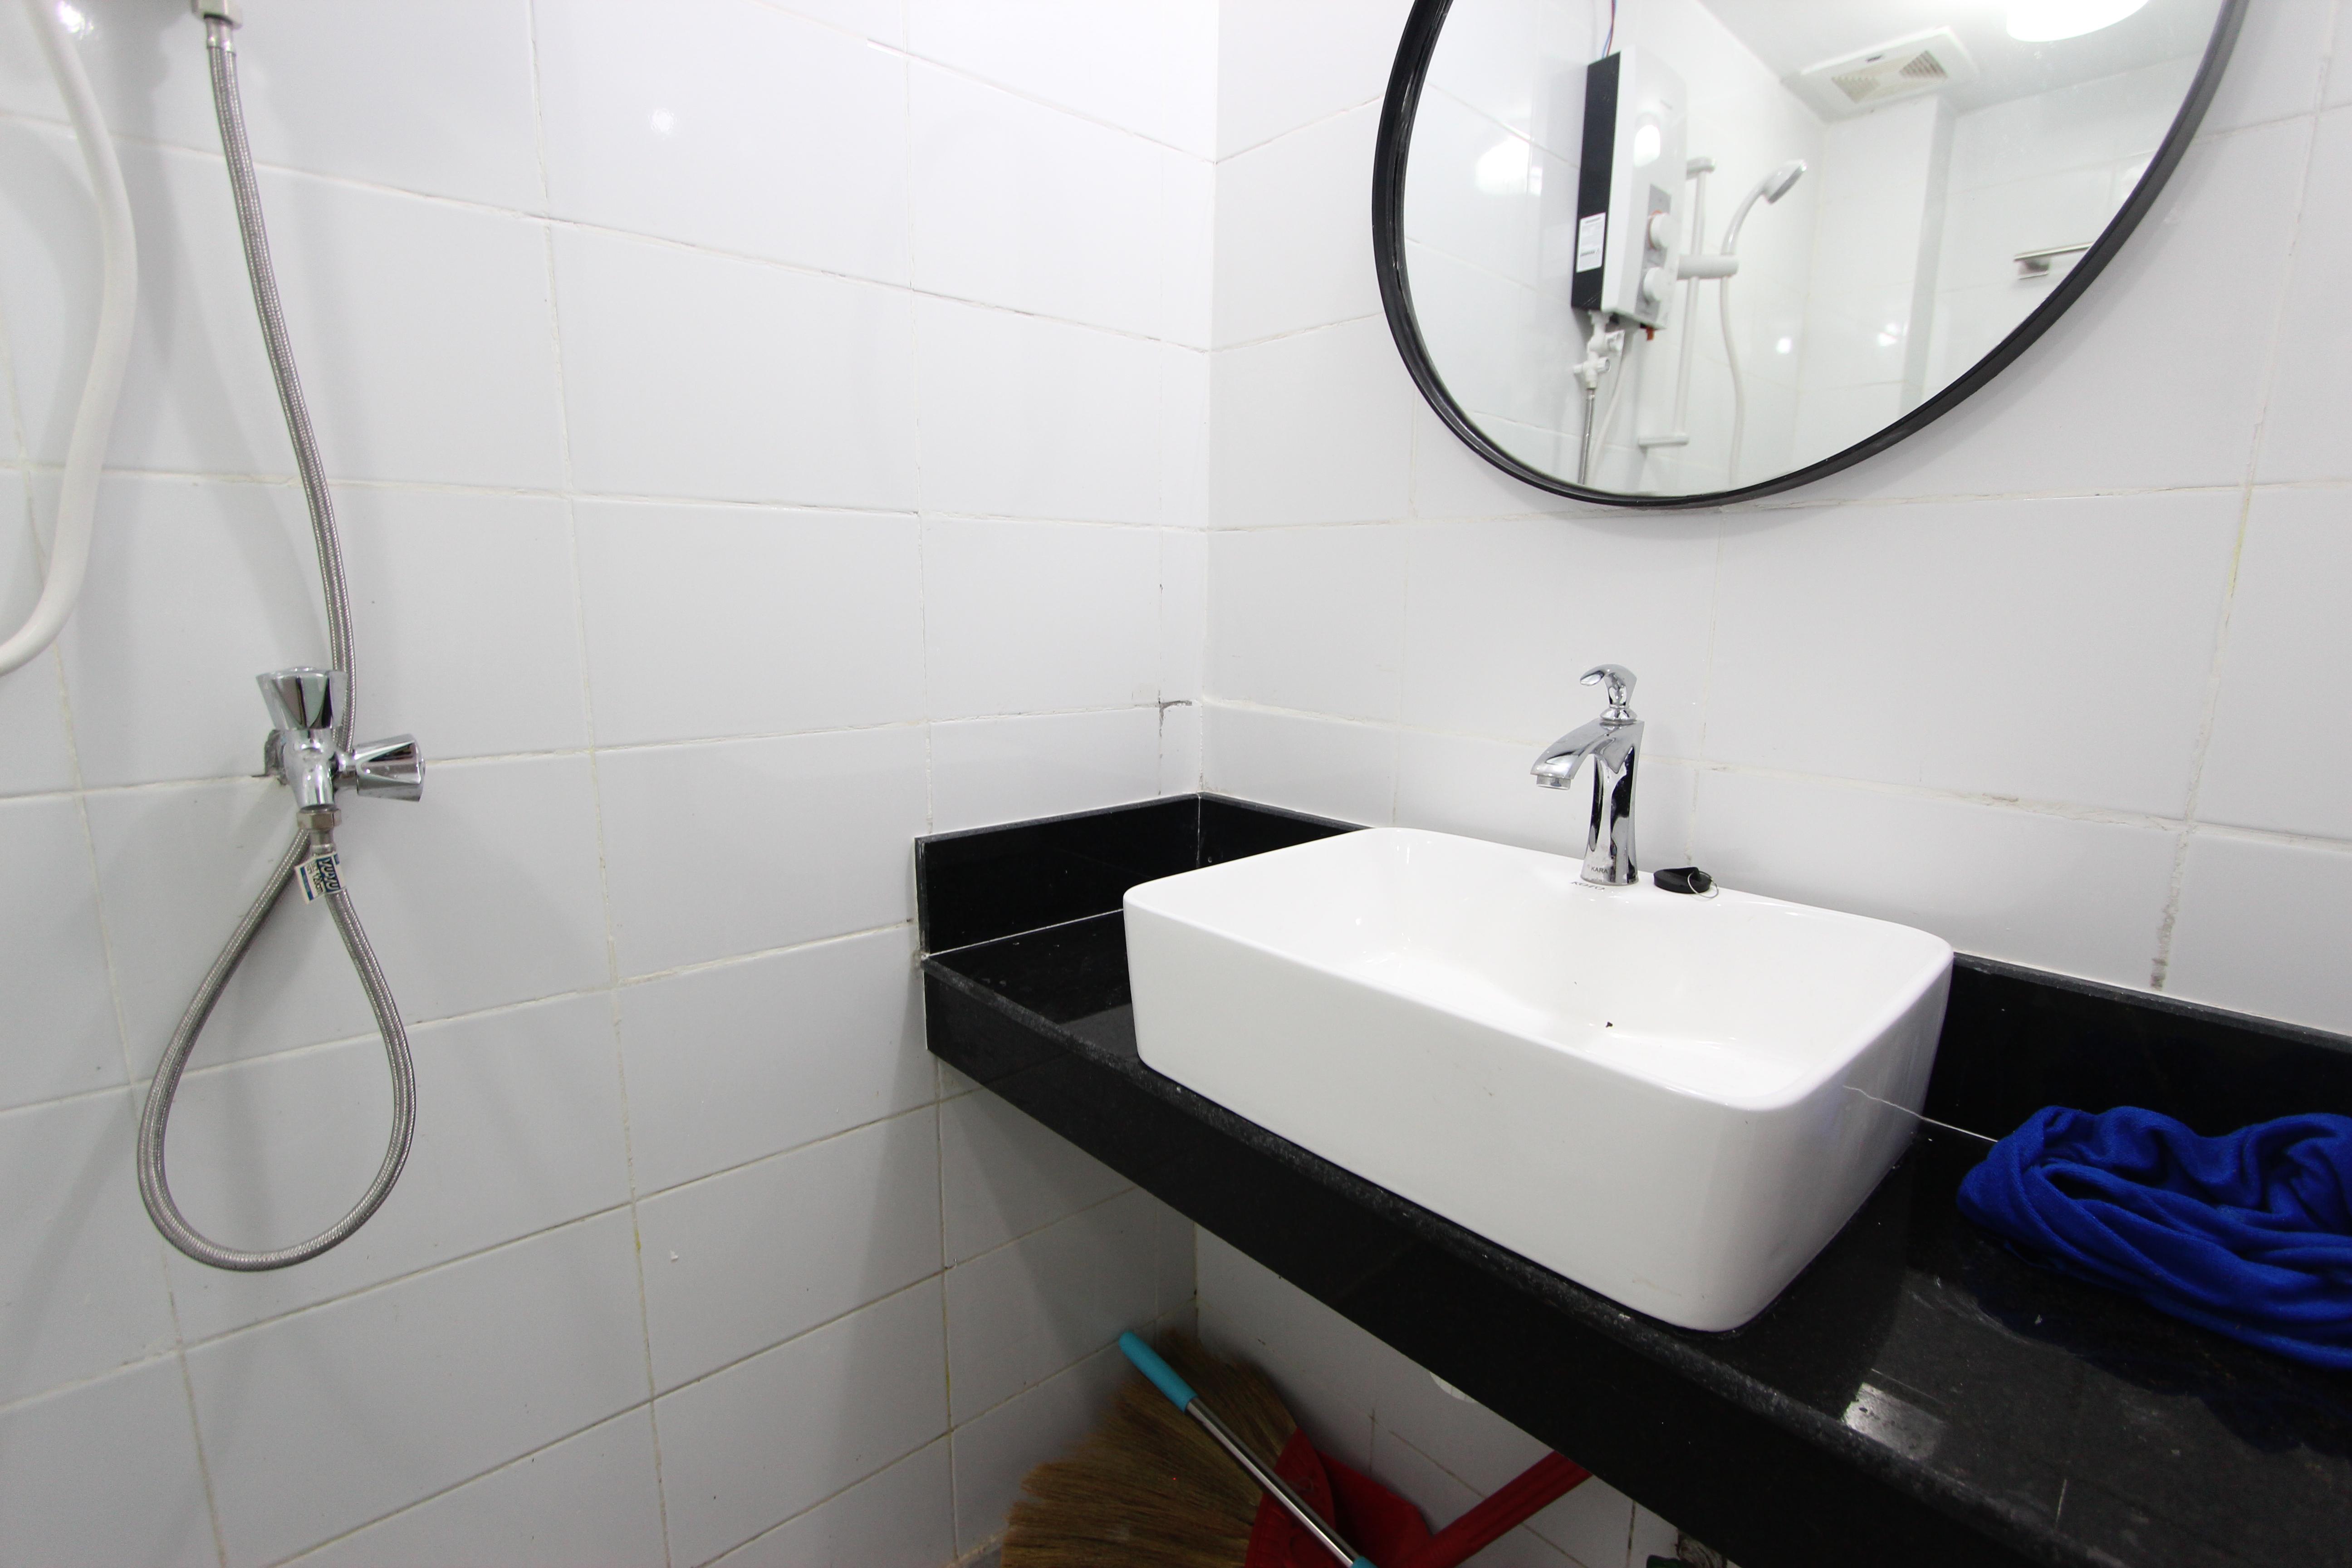 Newly Renovated 2 Bedroom Apartment In Daun Penh | Phnom Penh Real Estate